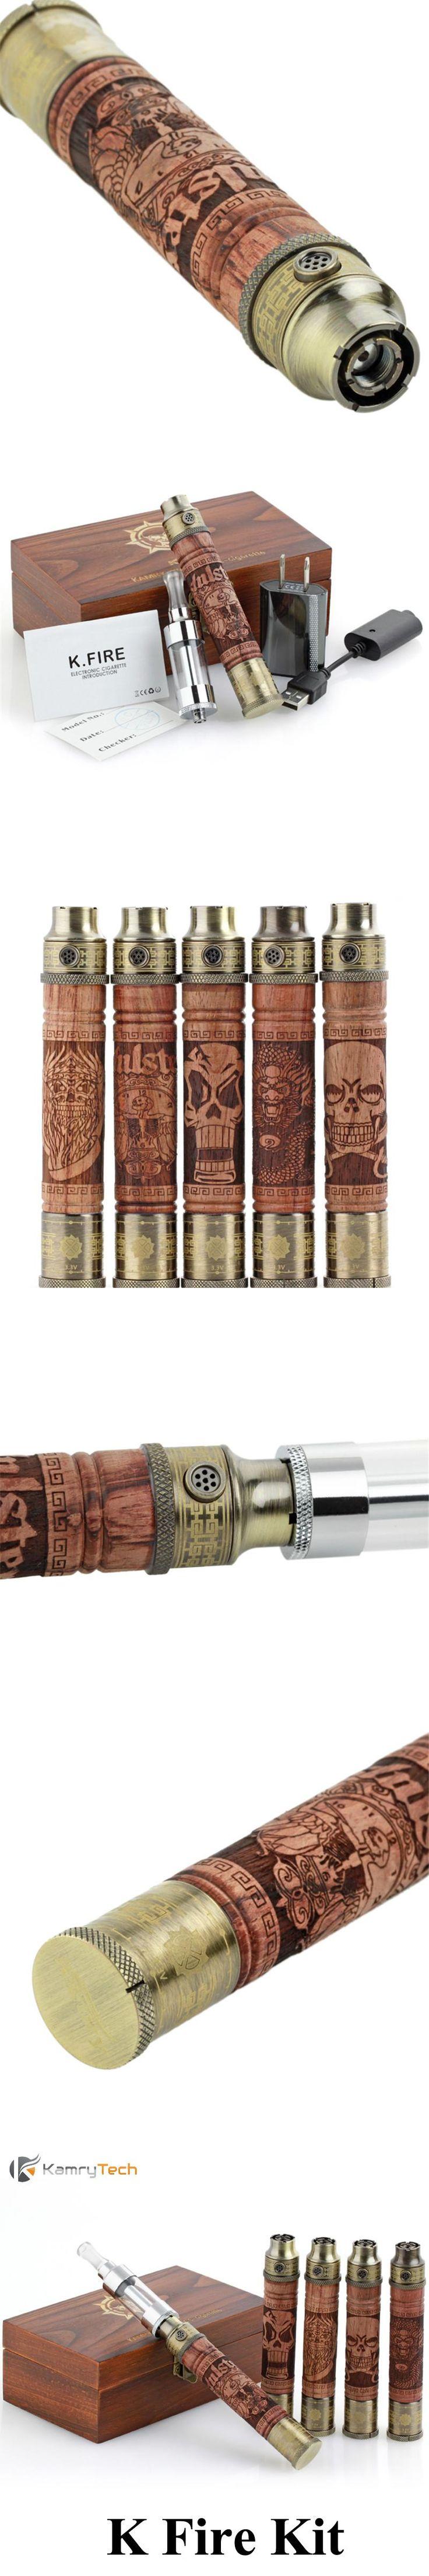 Electronic Cigarette Vape Pen Original Kamry K Fire Kit Wood Skull X Fire 2 Ego Vaporizer Dragon Ghost EVOD E Cigarette  X2026